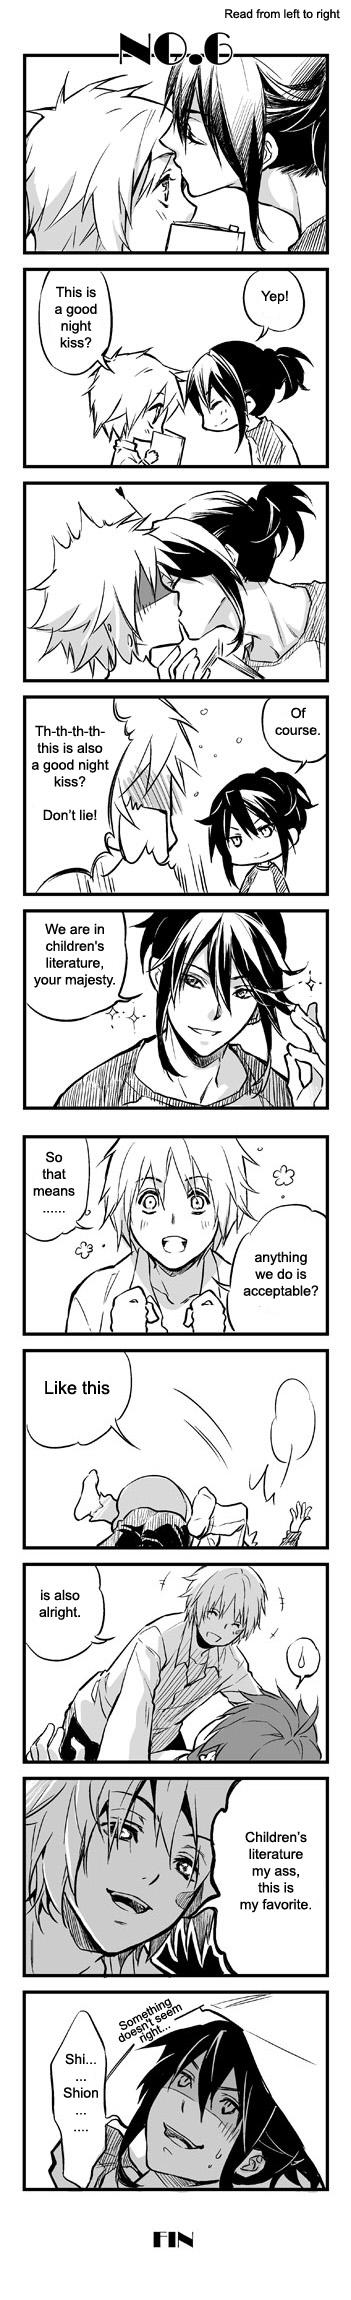 Tags: Anime, No.6, Shion (No.6), Nezumi (No.6), Artist Request, Comic, NezuShi